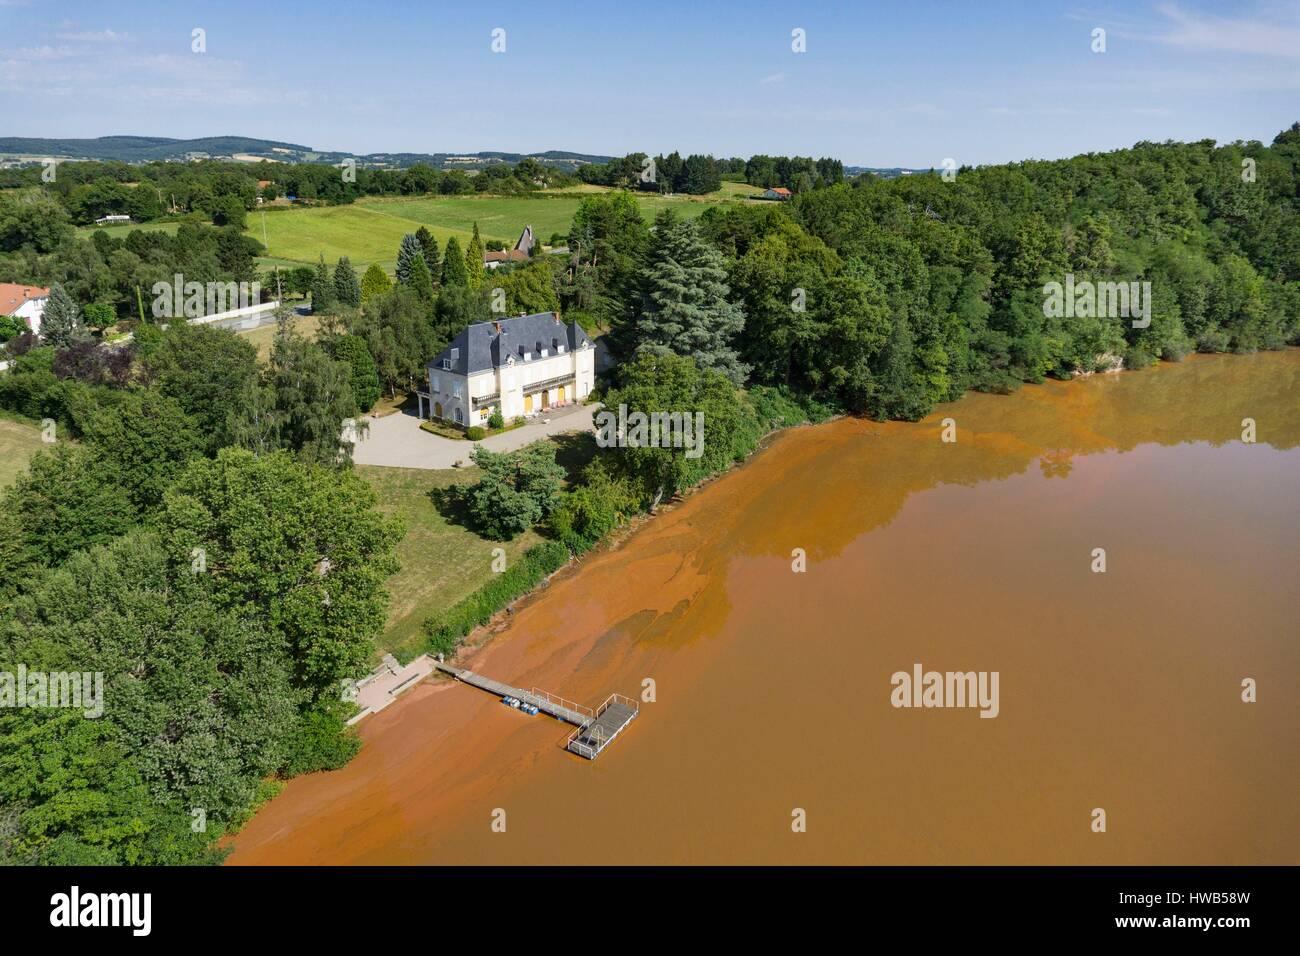 France, Puy de Dome, Charbonnieres les Vieilles, Gour de Tazenat, Maar volcano type, the red color of the water - Stock Image